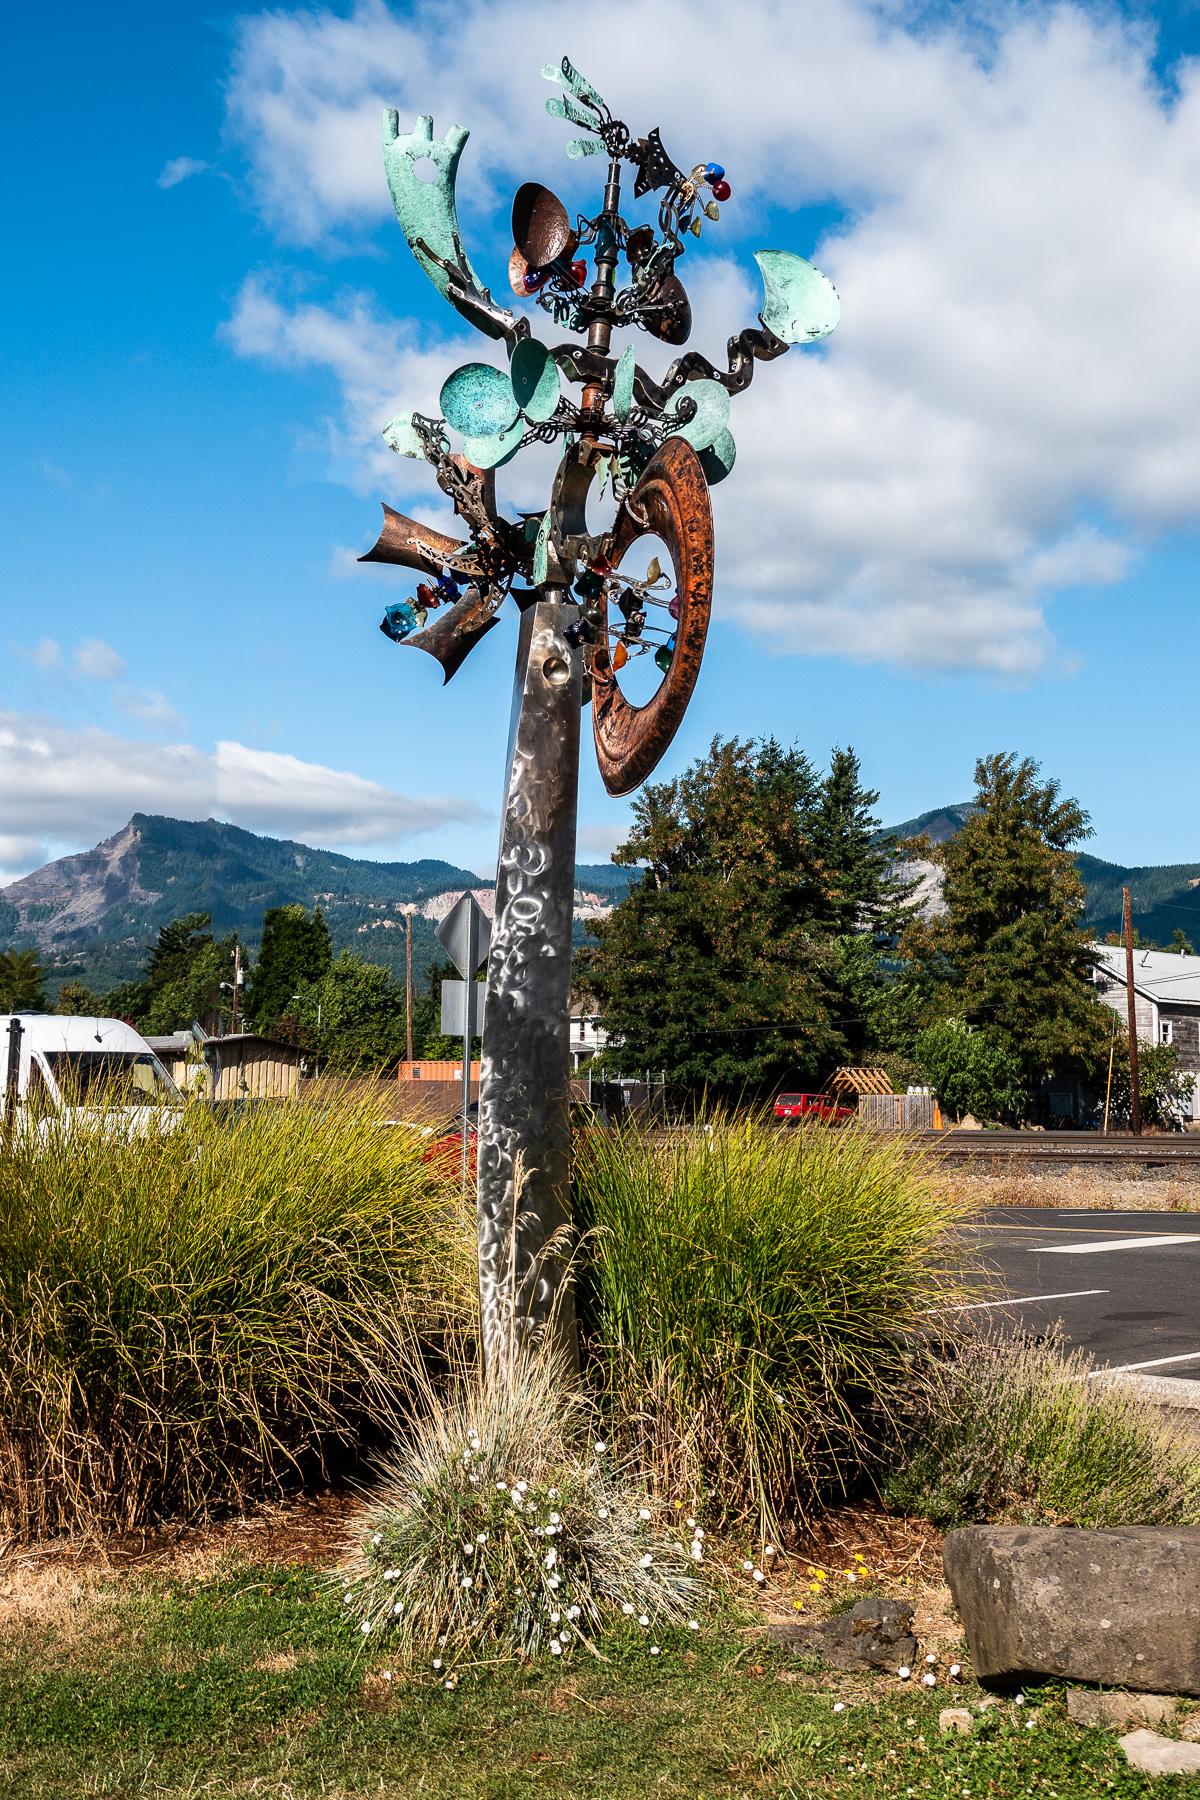 Moving sculpture near boarding spot near the stern wheeler boarding arean Stevenson, Washington